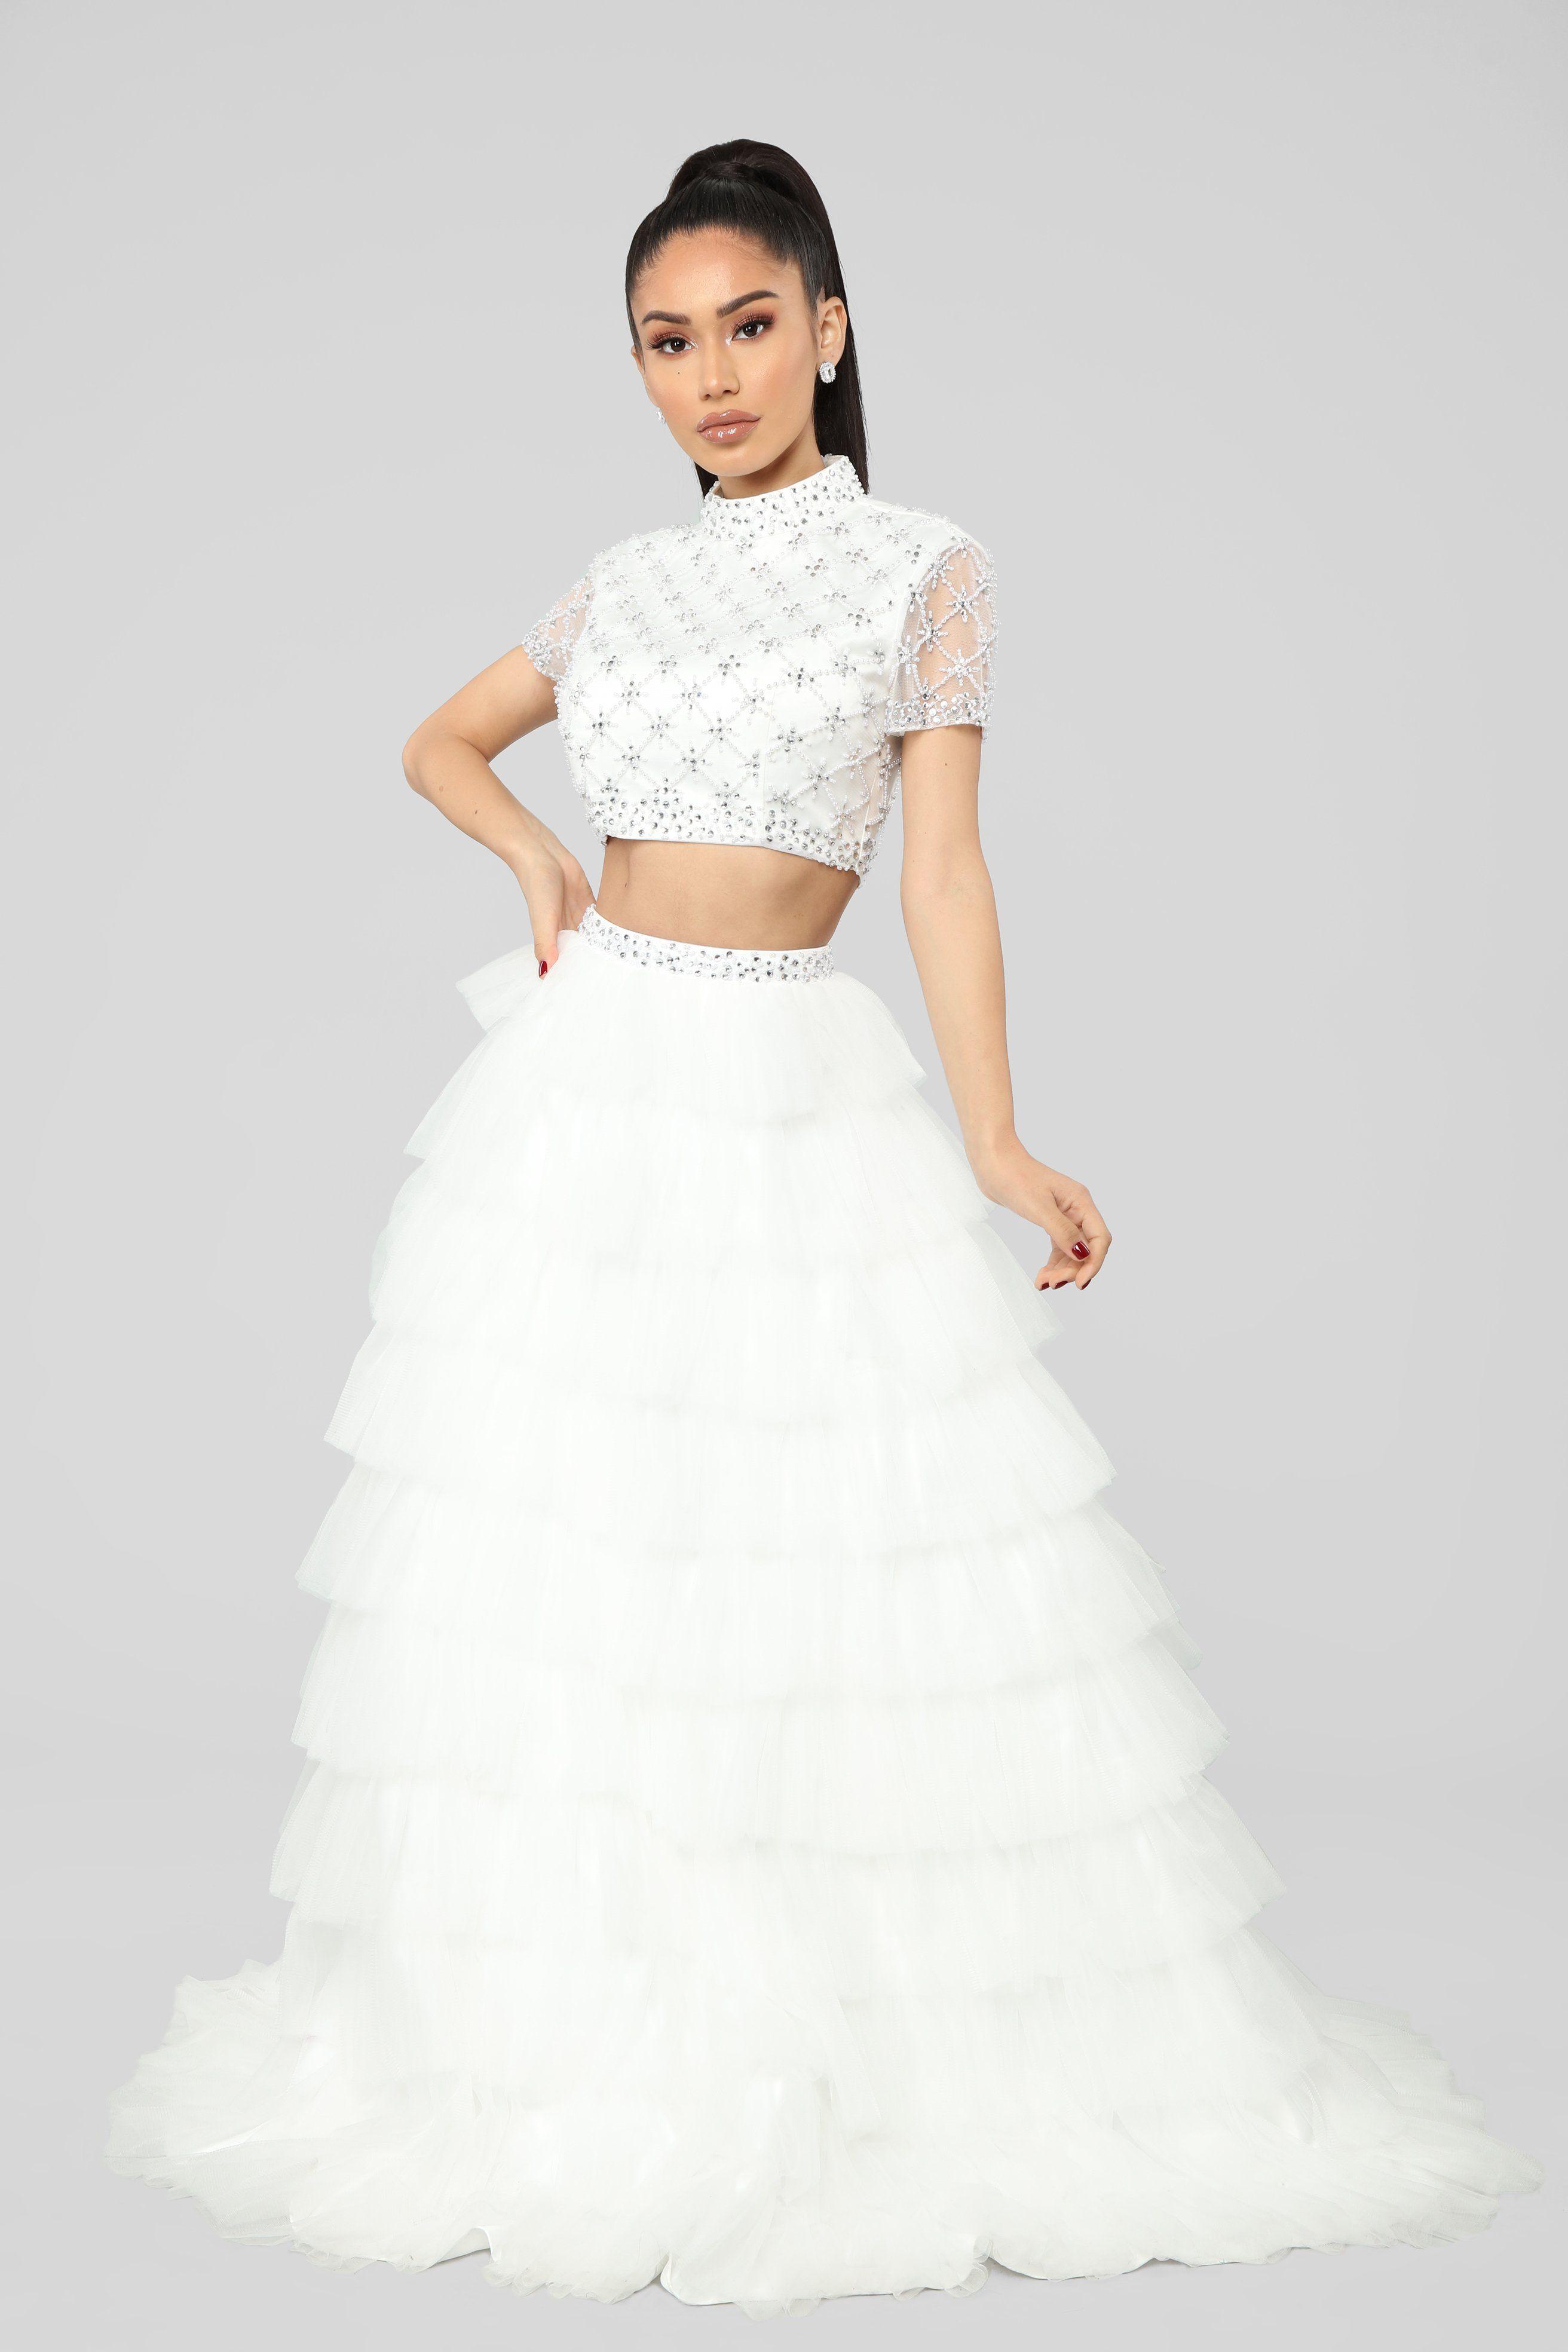 Best Two Piece Prom Dresses of 2019 \u2013 Stylish Crop Top Prom